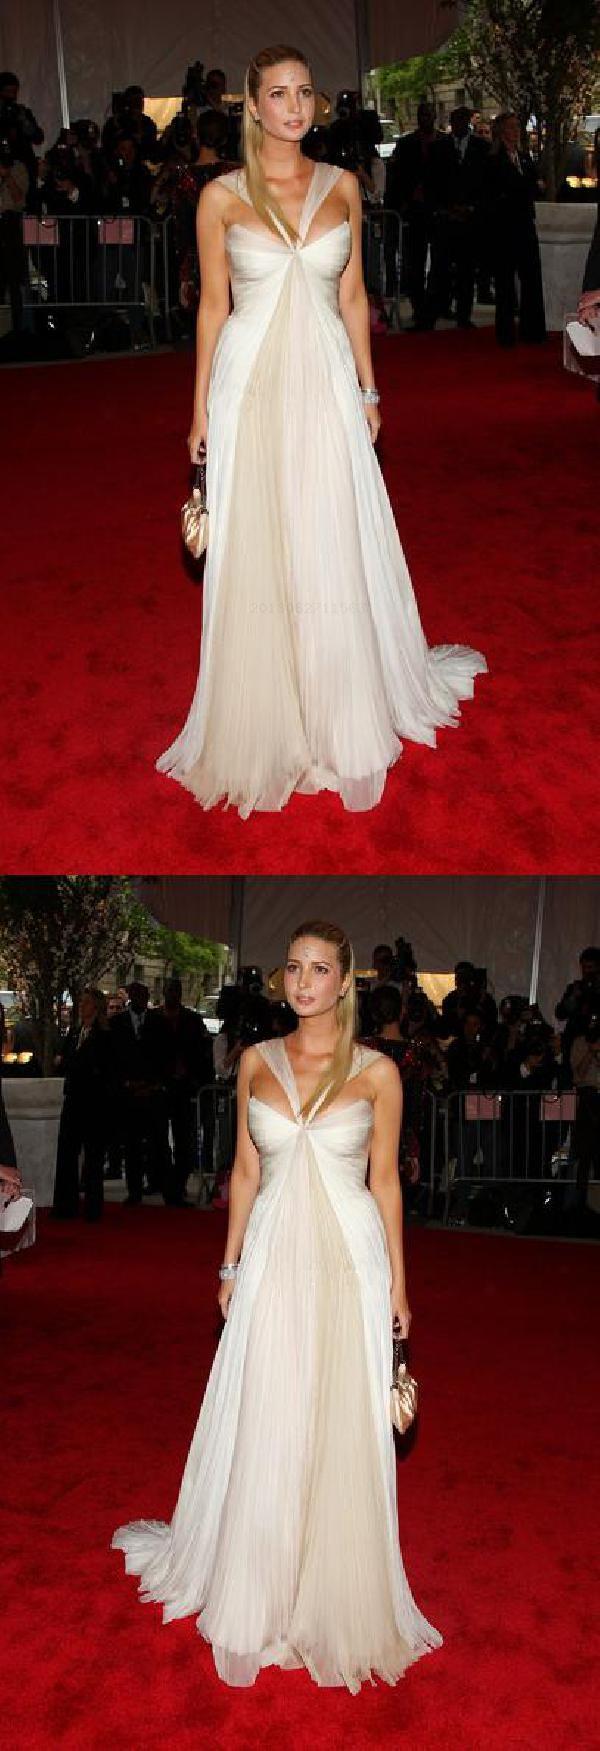 Sale great white dress ivanka trump white chiffon handsewn prom